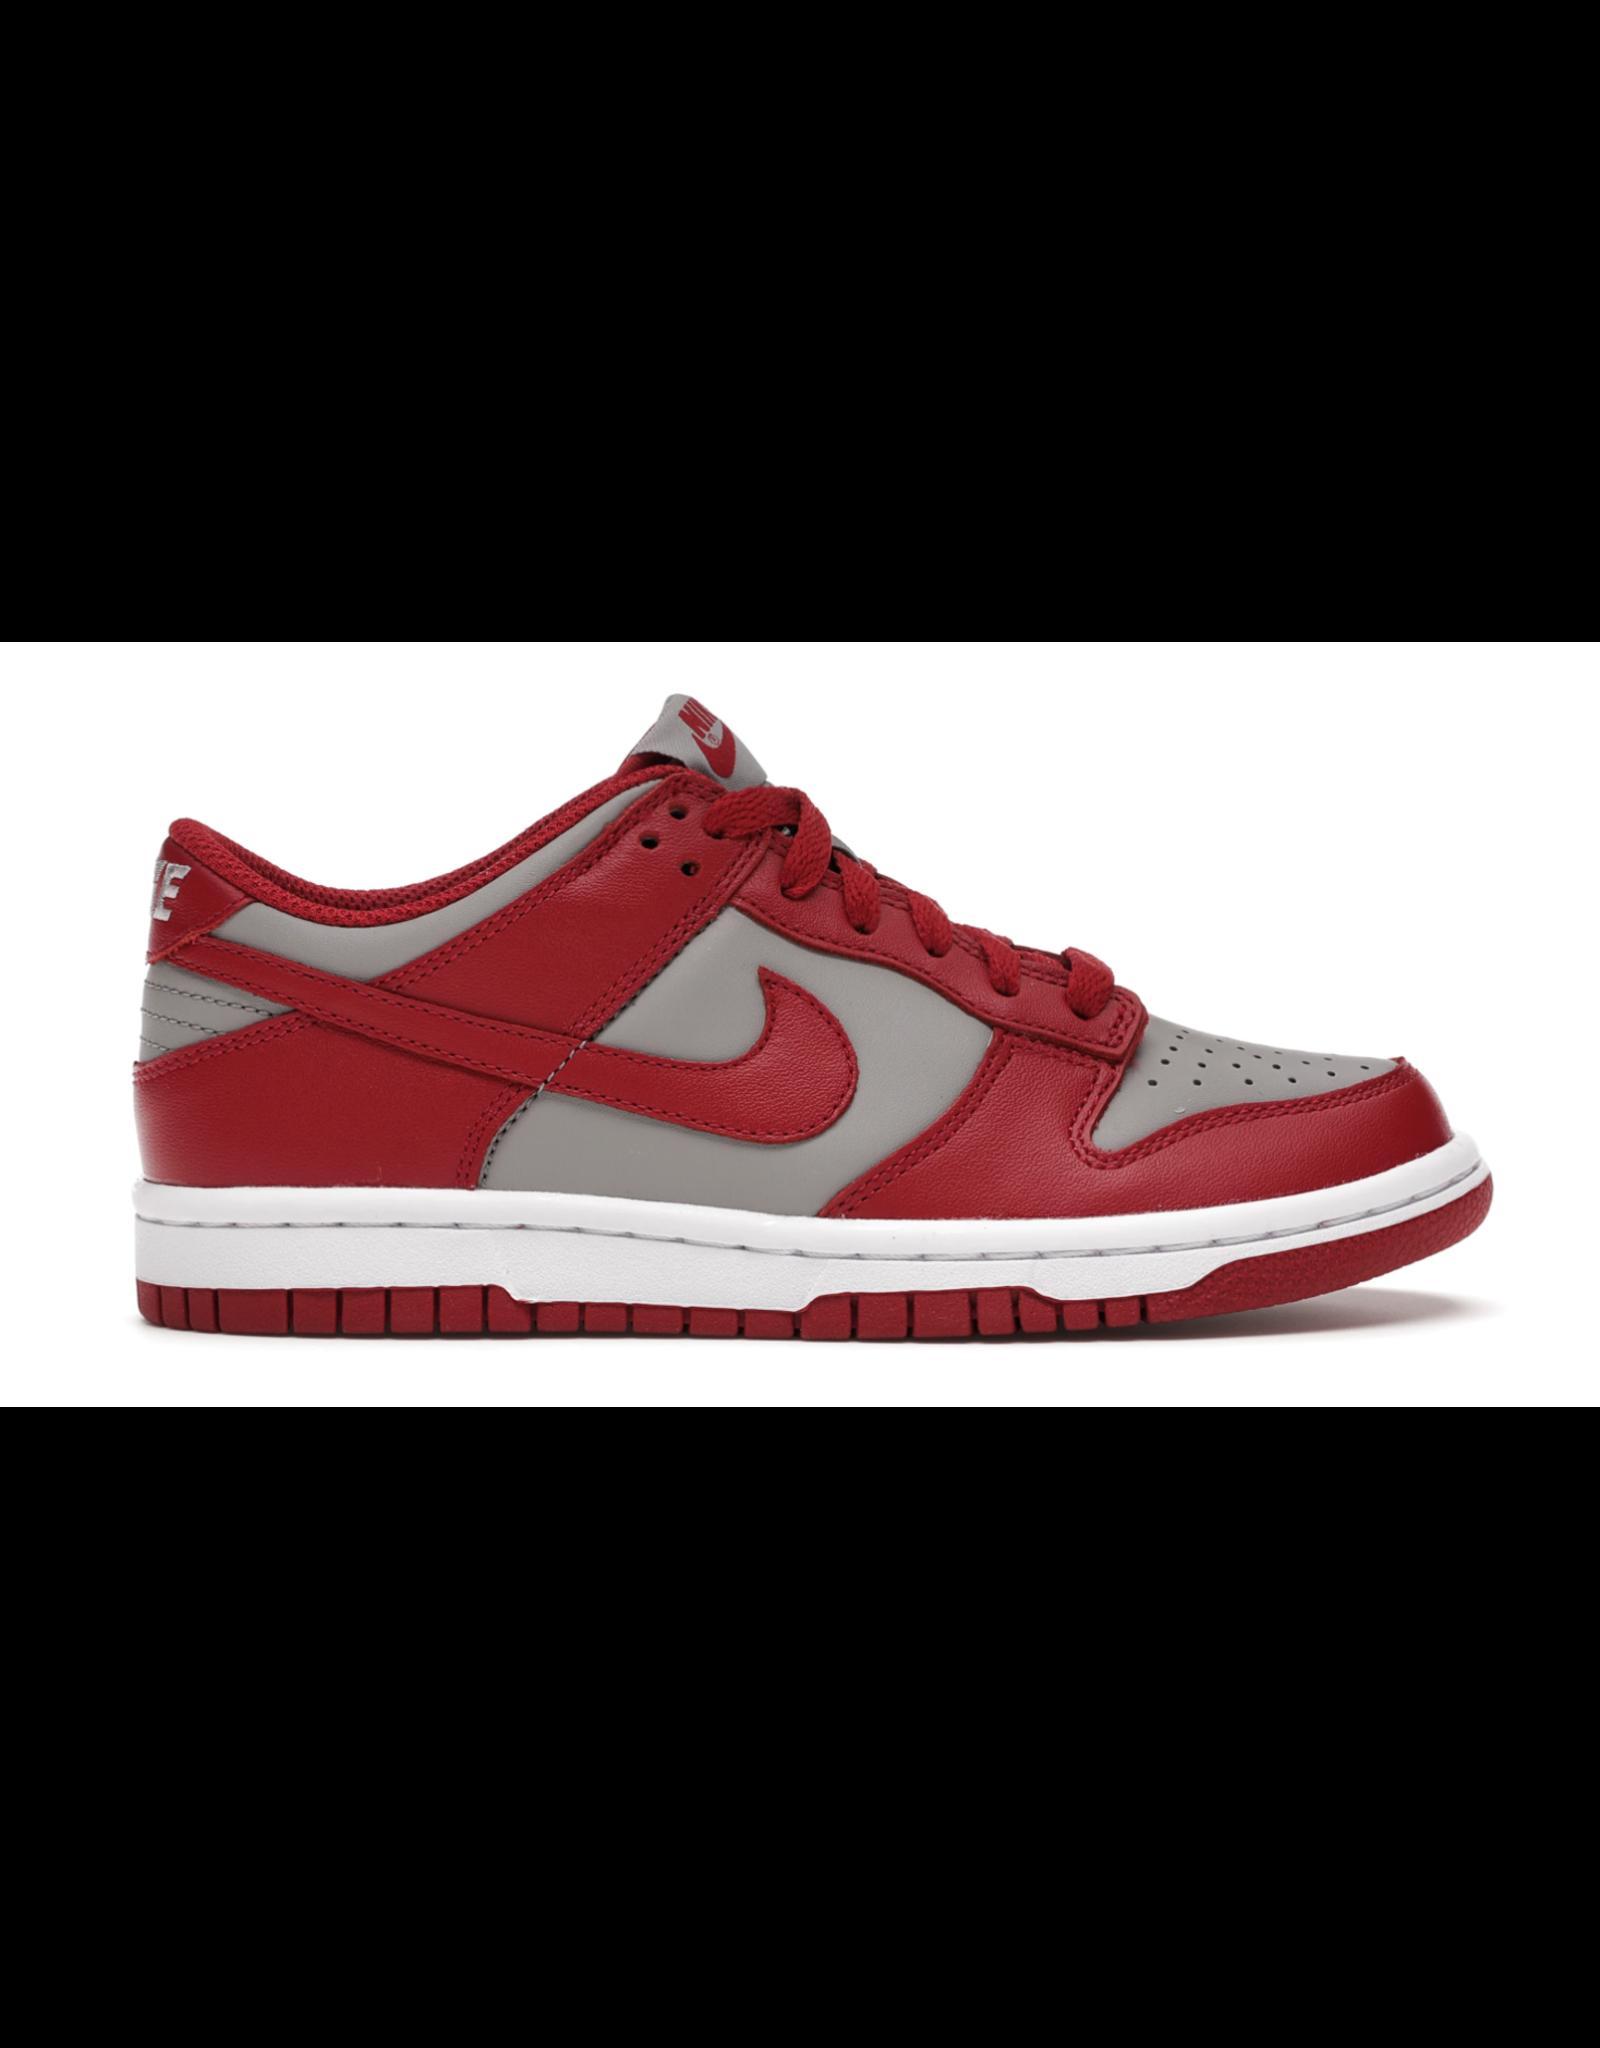 NIKE Nike Dunk Low Retro Medium Grey Varsity Red UNLV (GS) (2021)